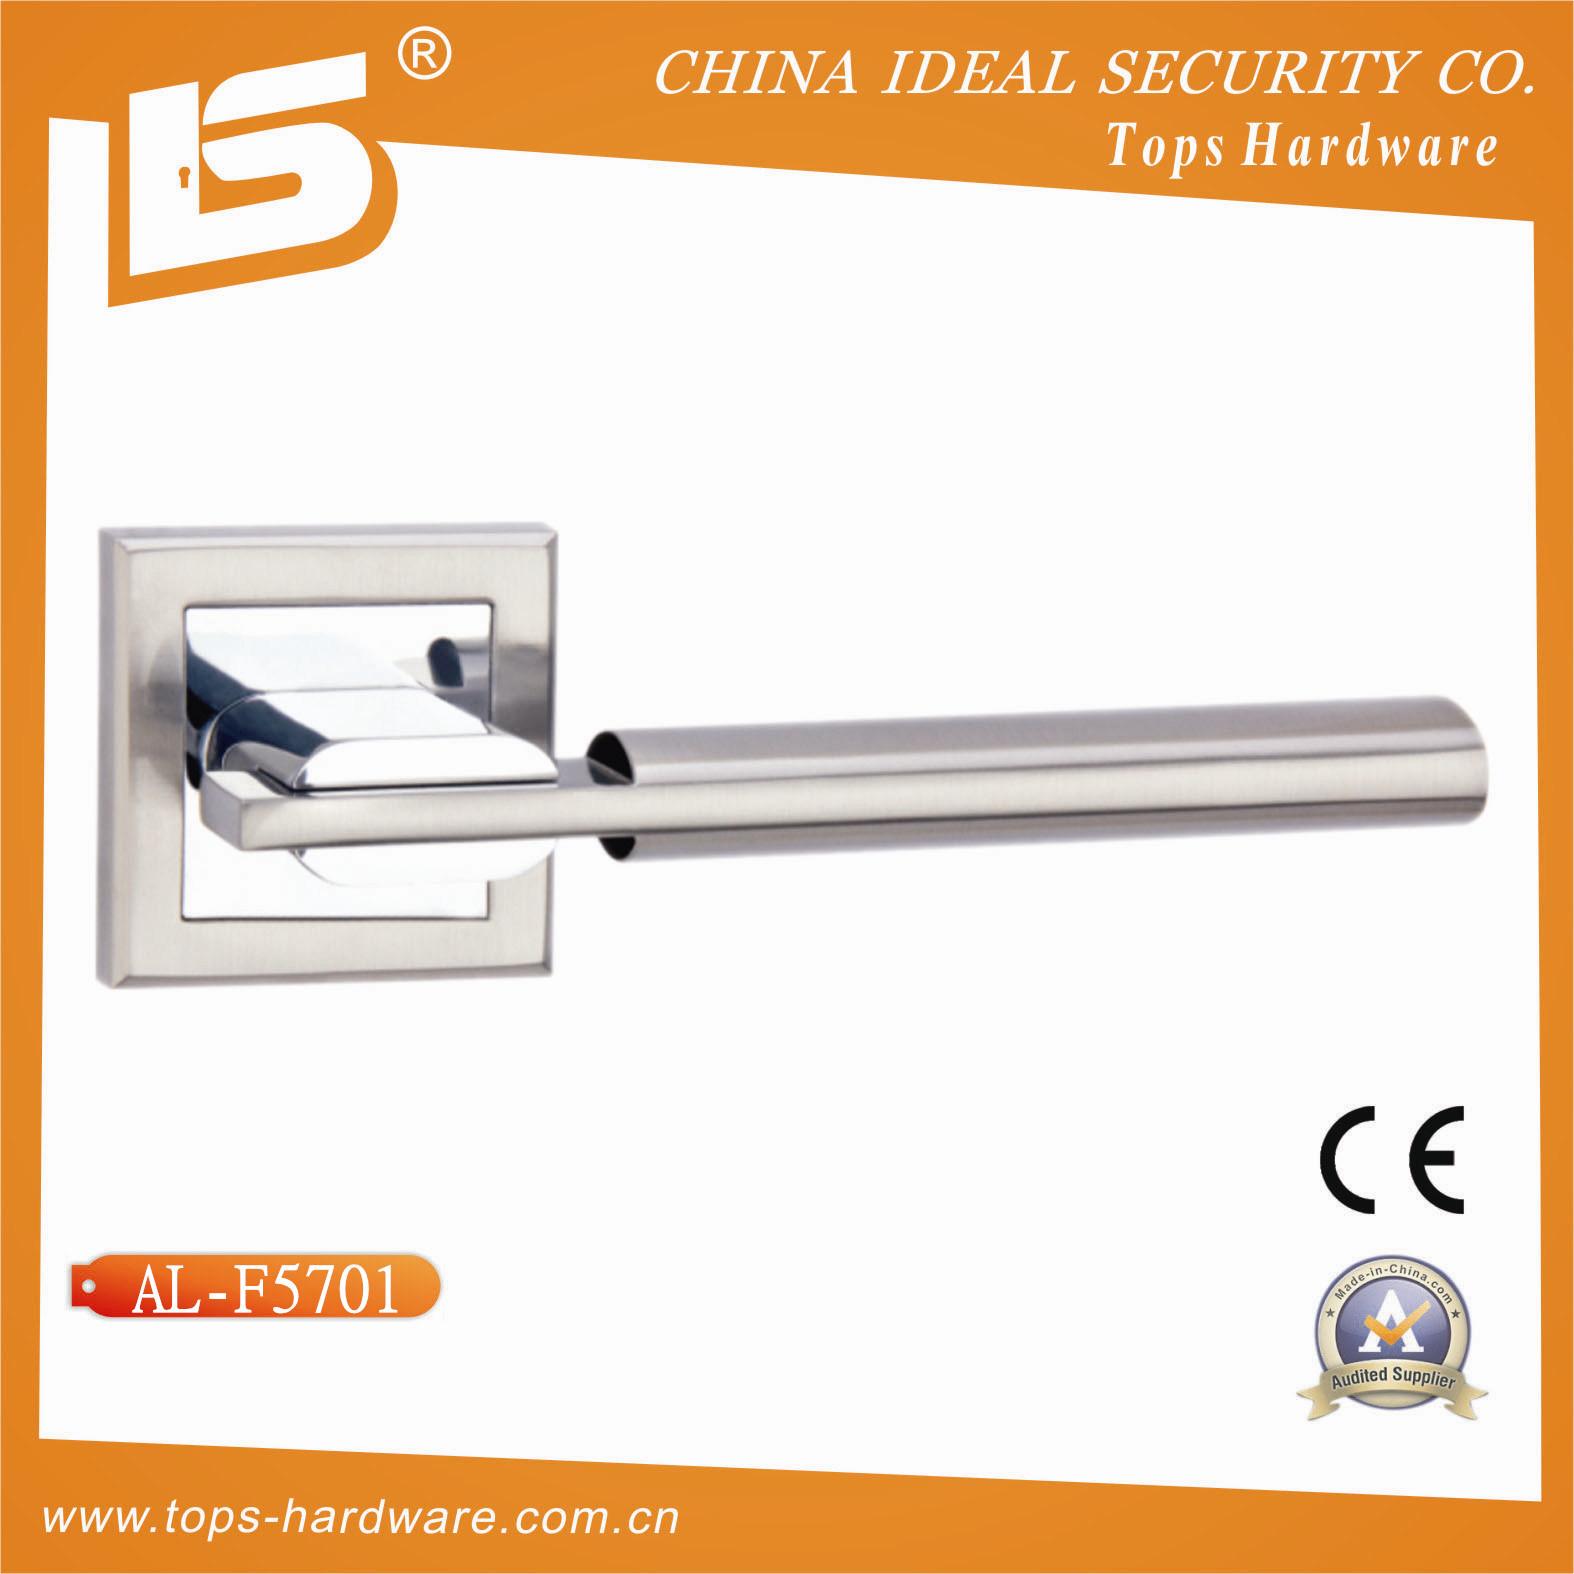 Door Handle on Rose High Quality (AL-F5701)